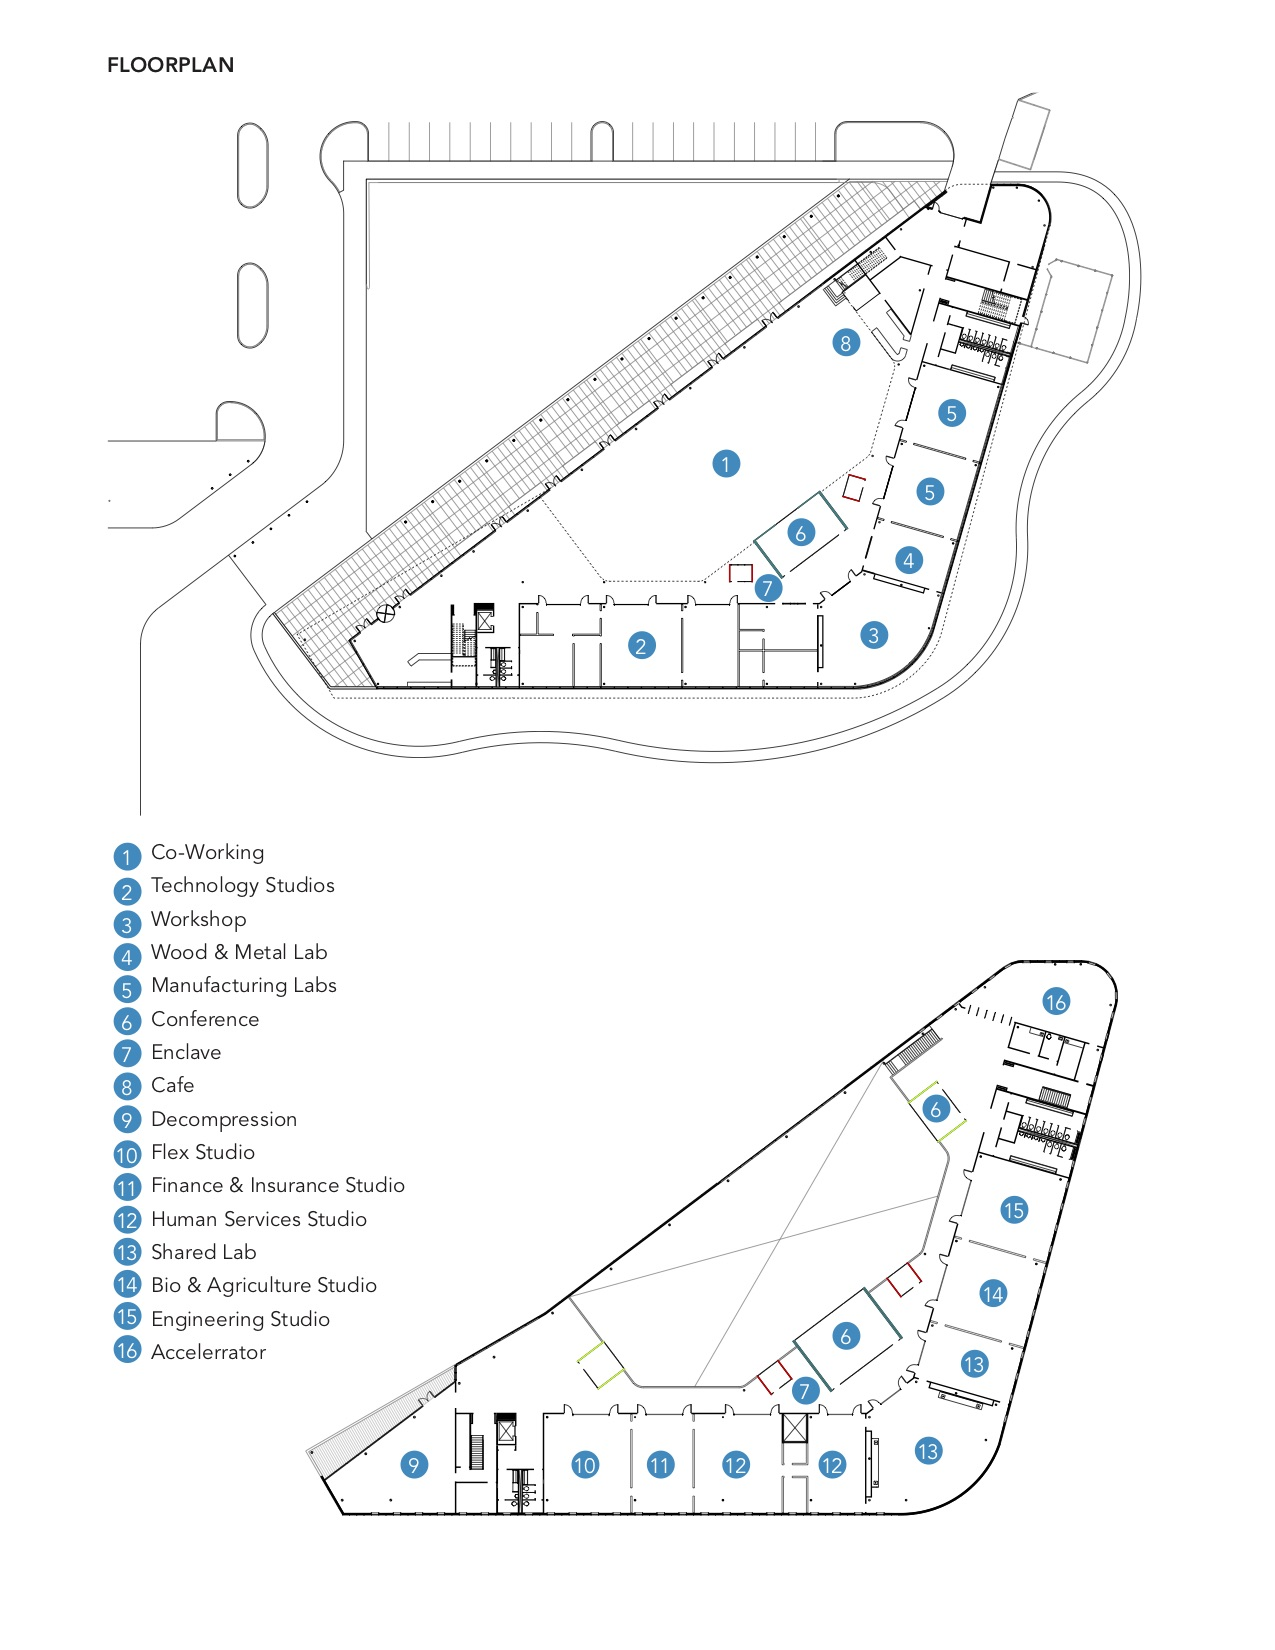 WILC_Floorplans.jpg